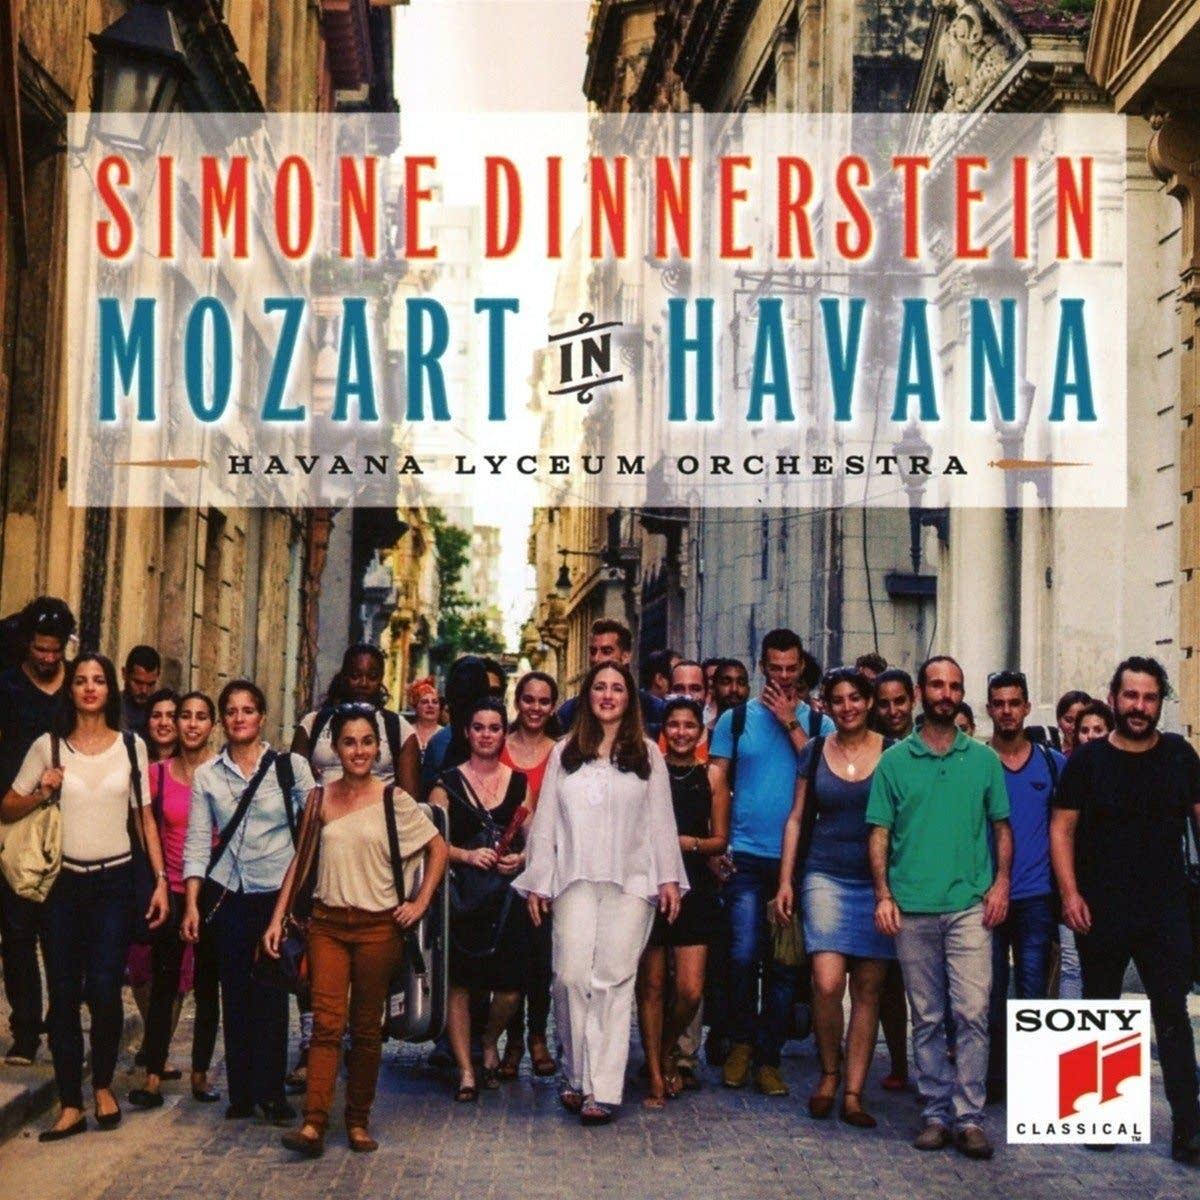 Simone Dinnerstein, 'Mozart in Havana'